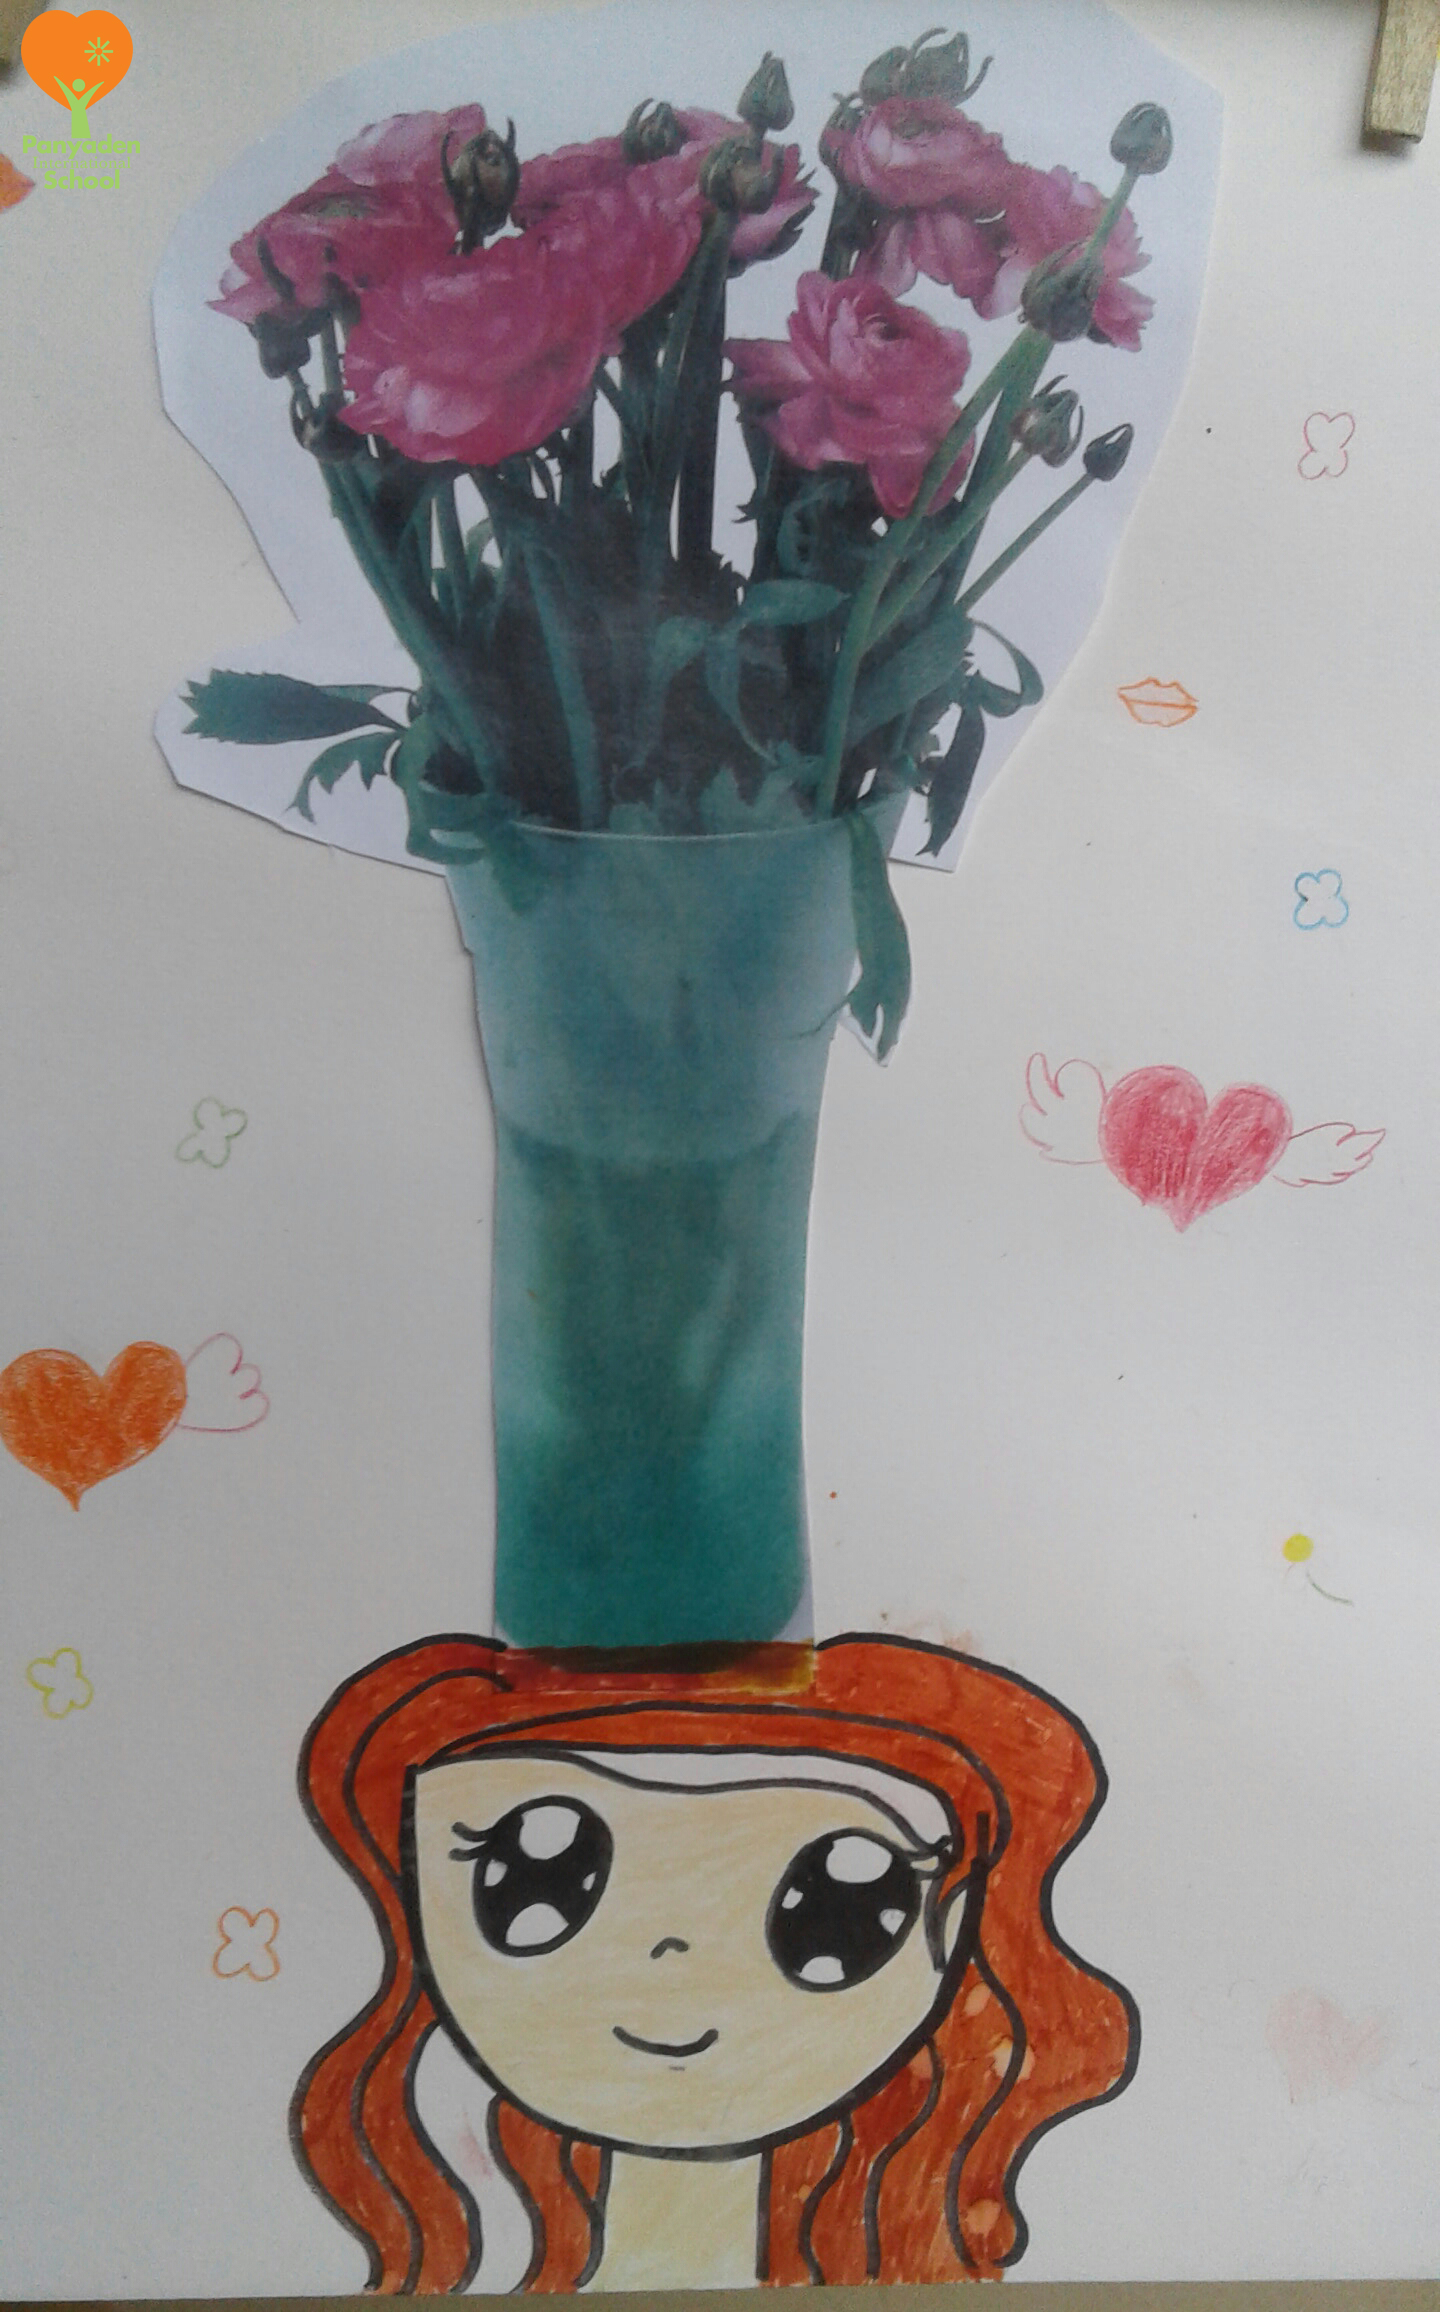 Surreal vase of flowers by Panyaden International School student